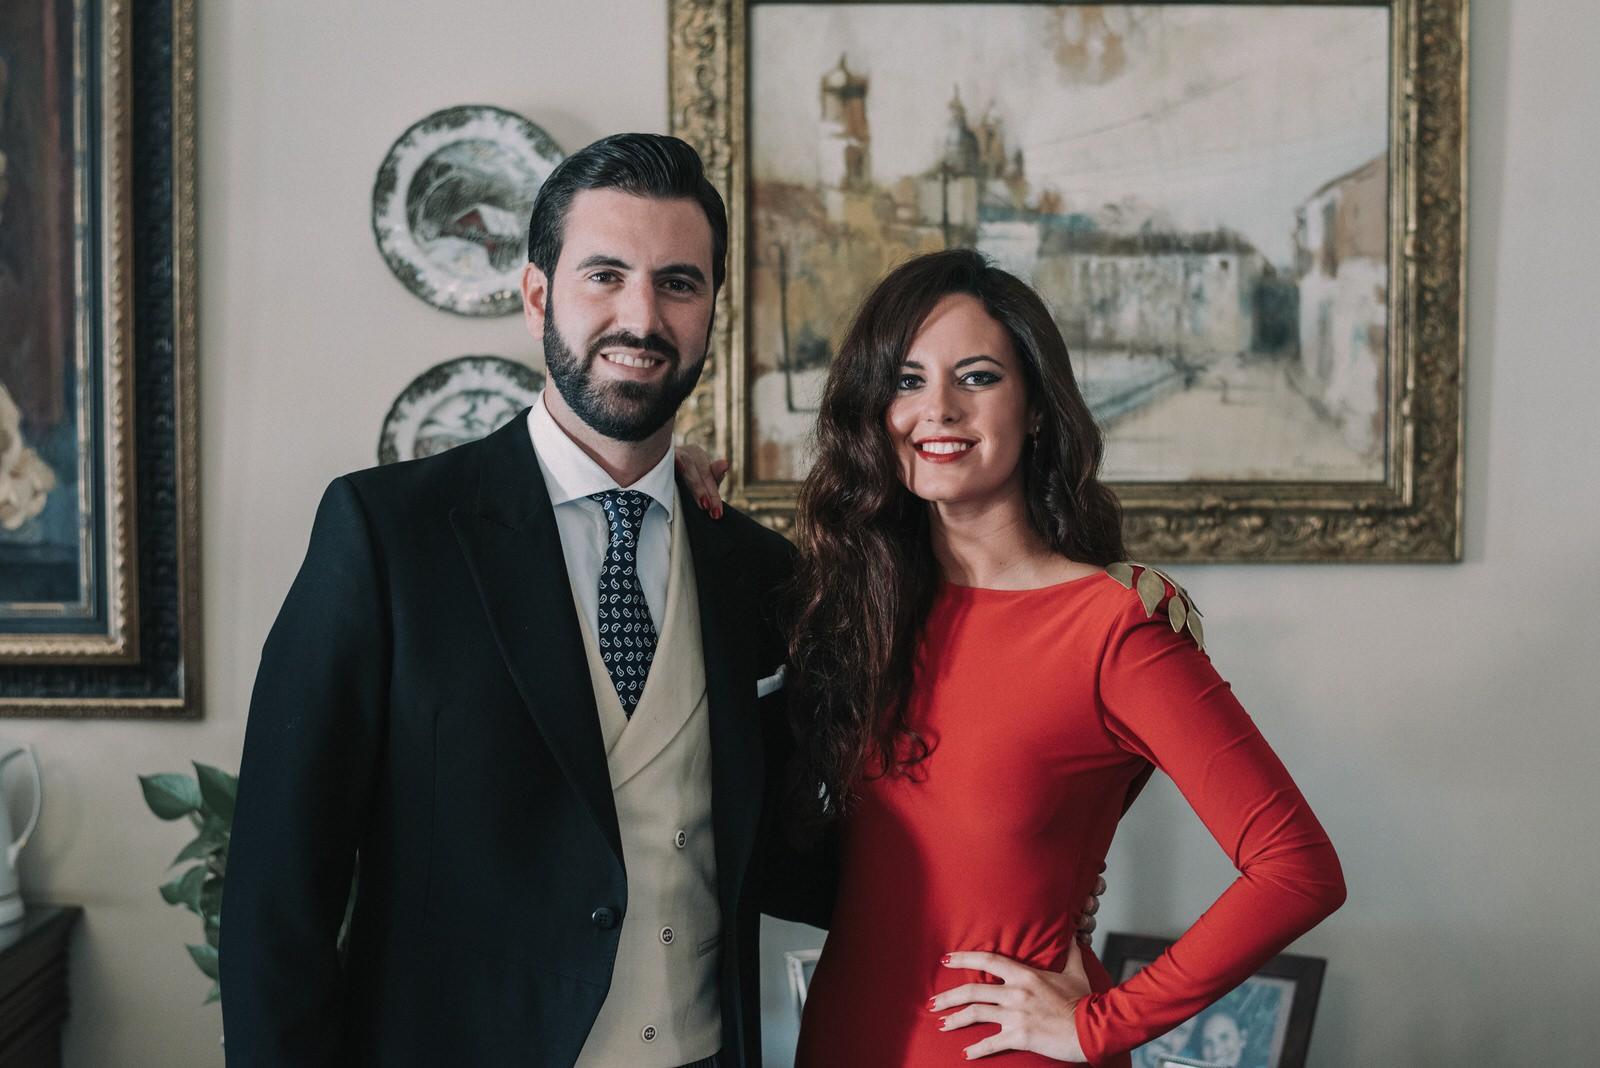 fotografo de bodas sevilla - fotografo boda - fotografía sevilla - Andrés AmarilloAAA_4405- tele- fine.JPG